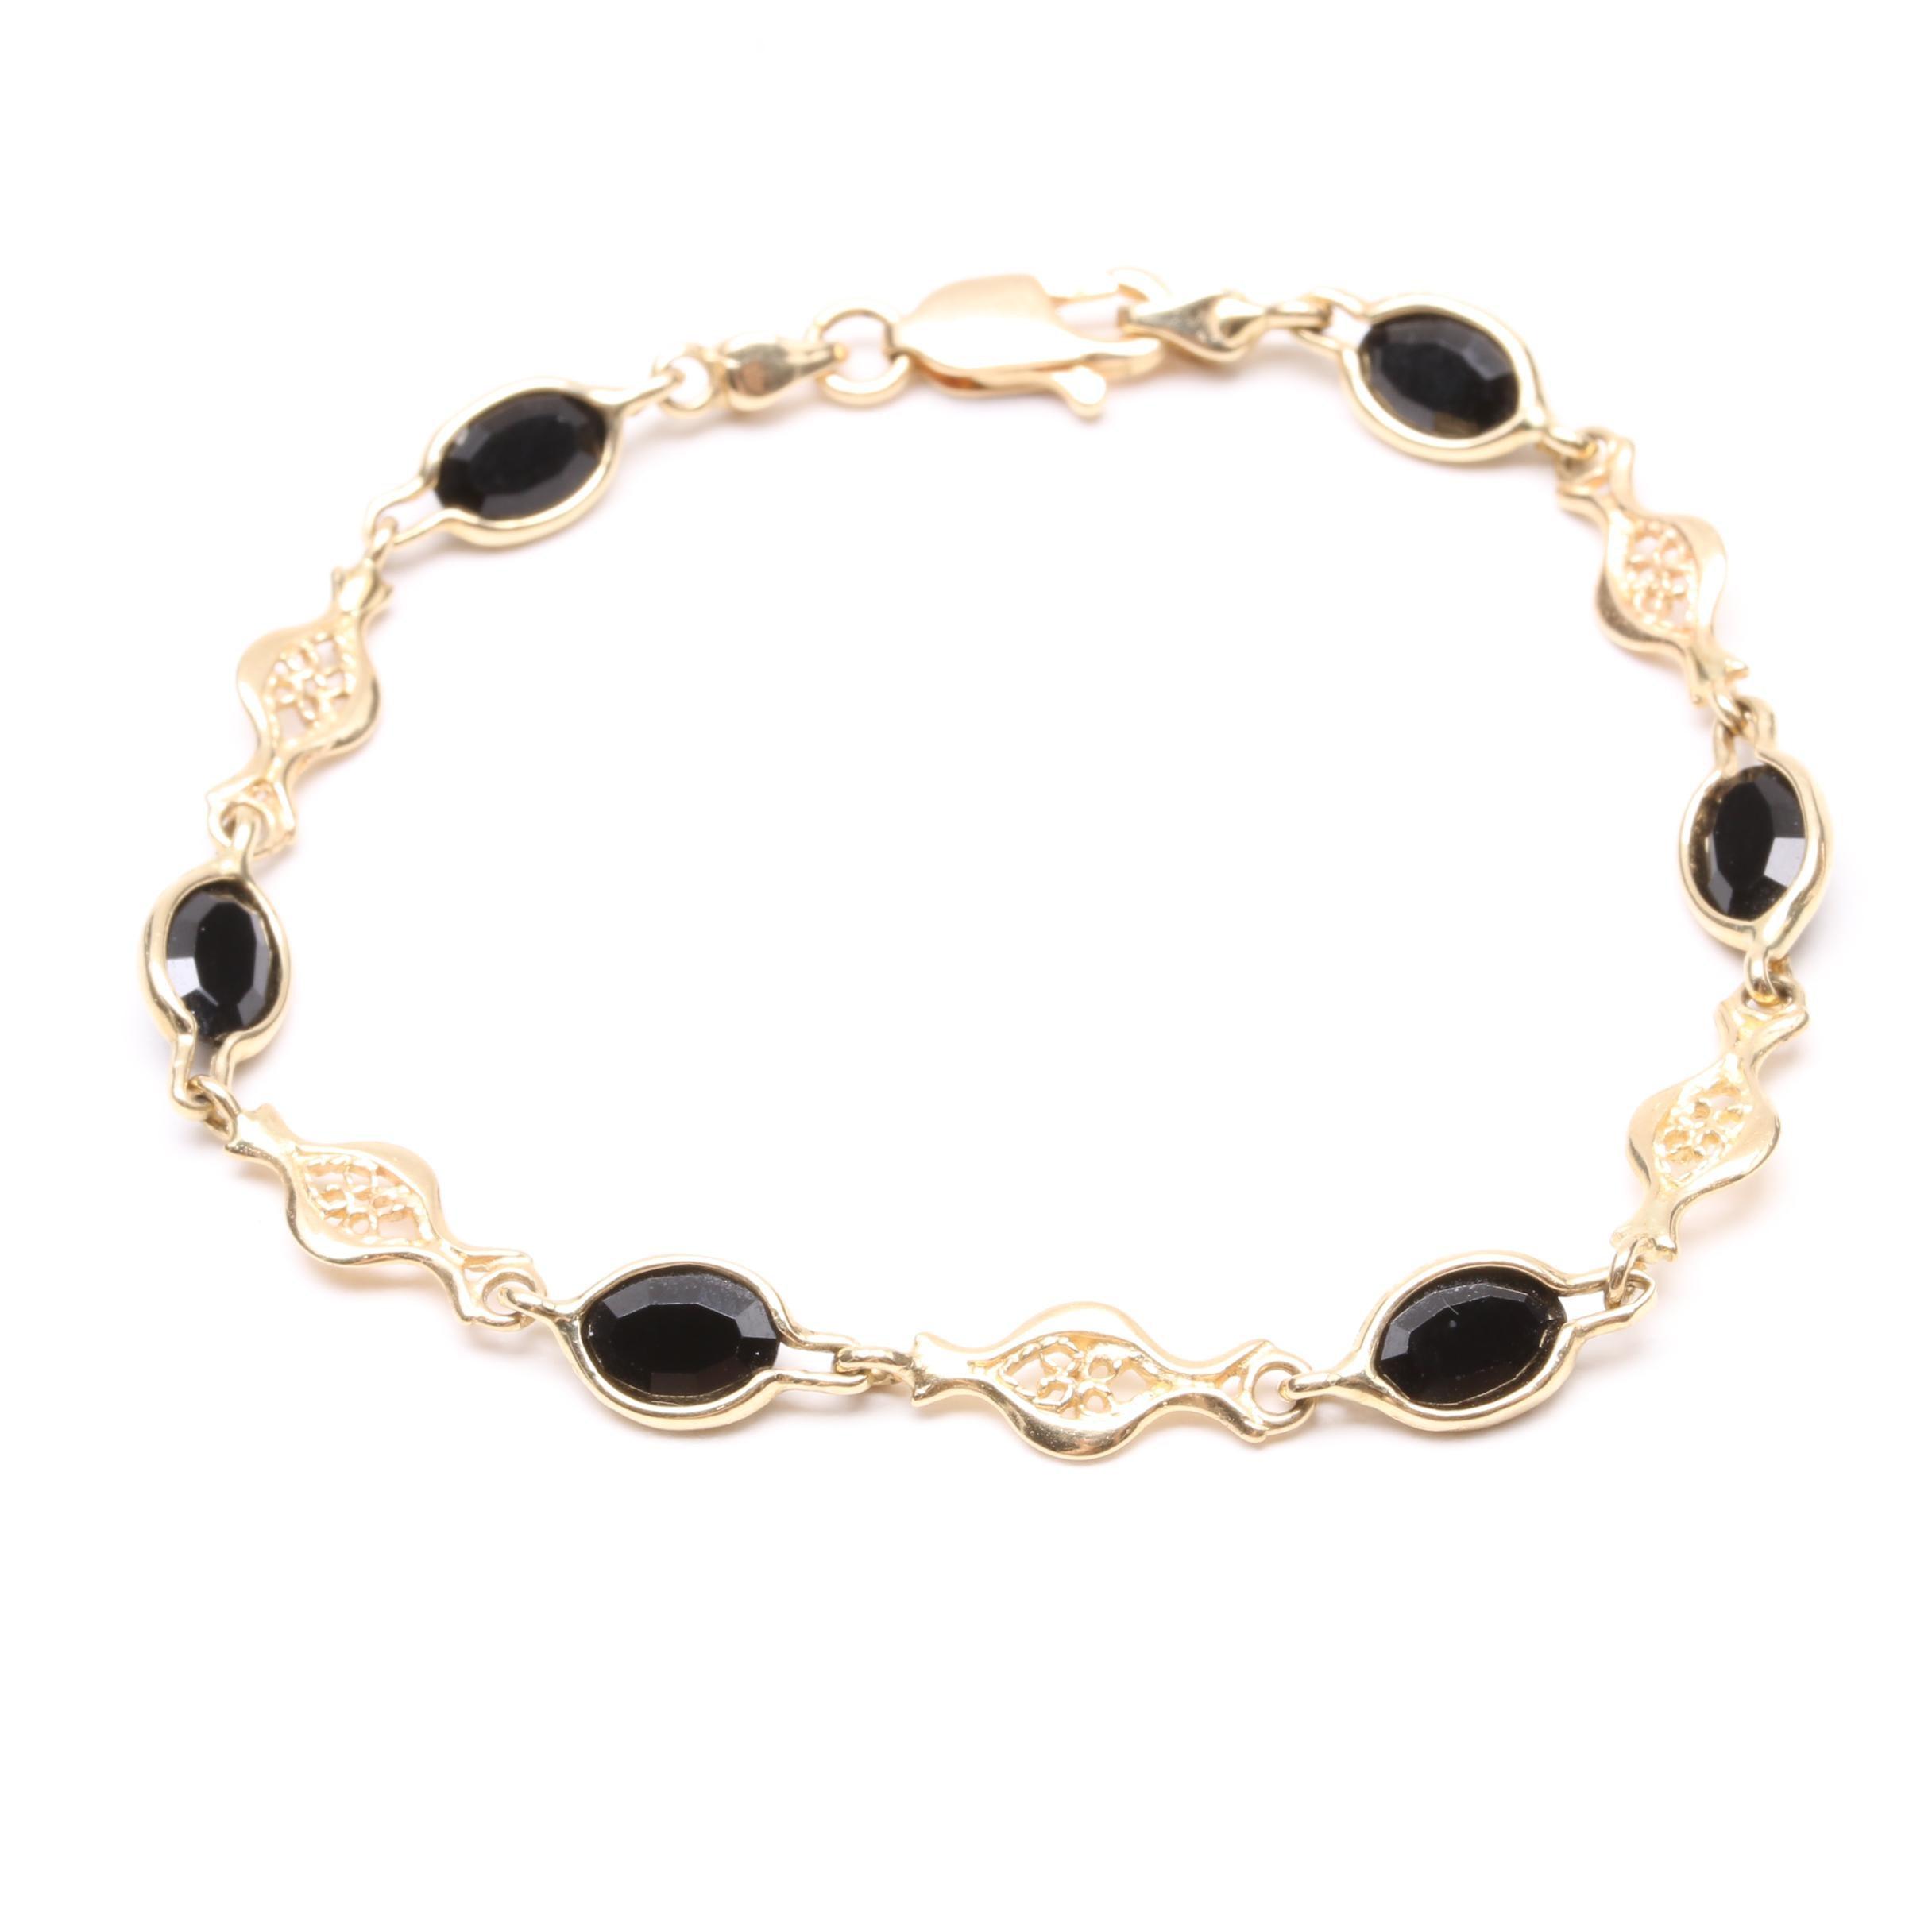 14K Yellow Gold Synthetic Black Spinel Bracelet